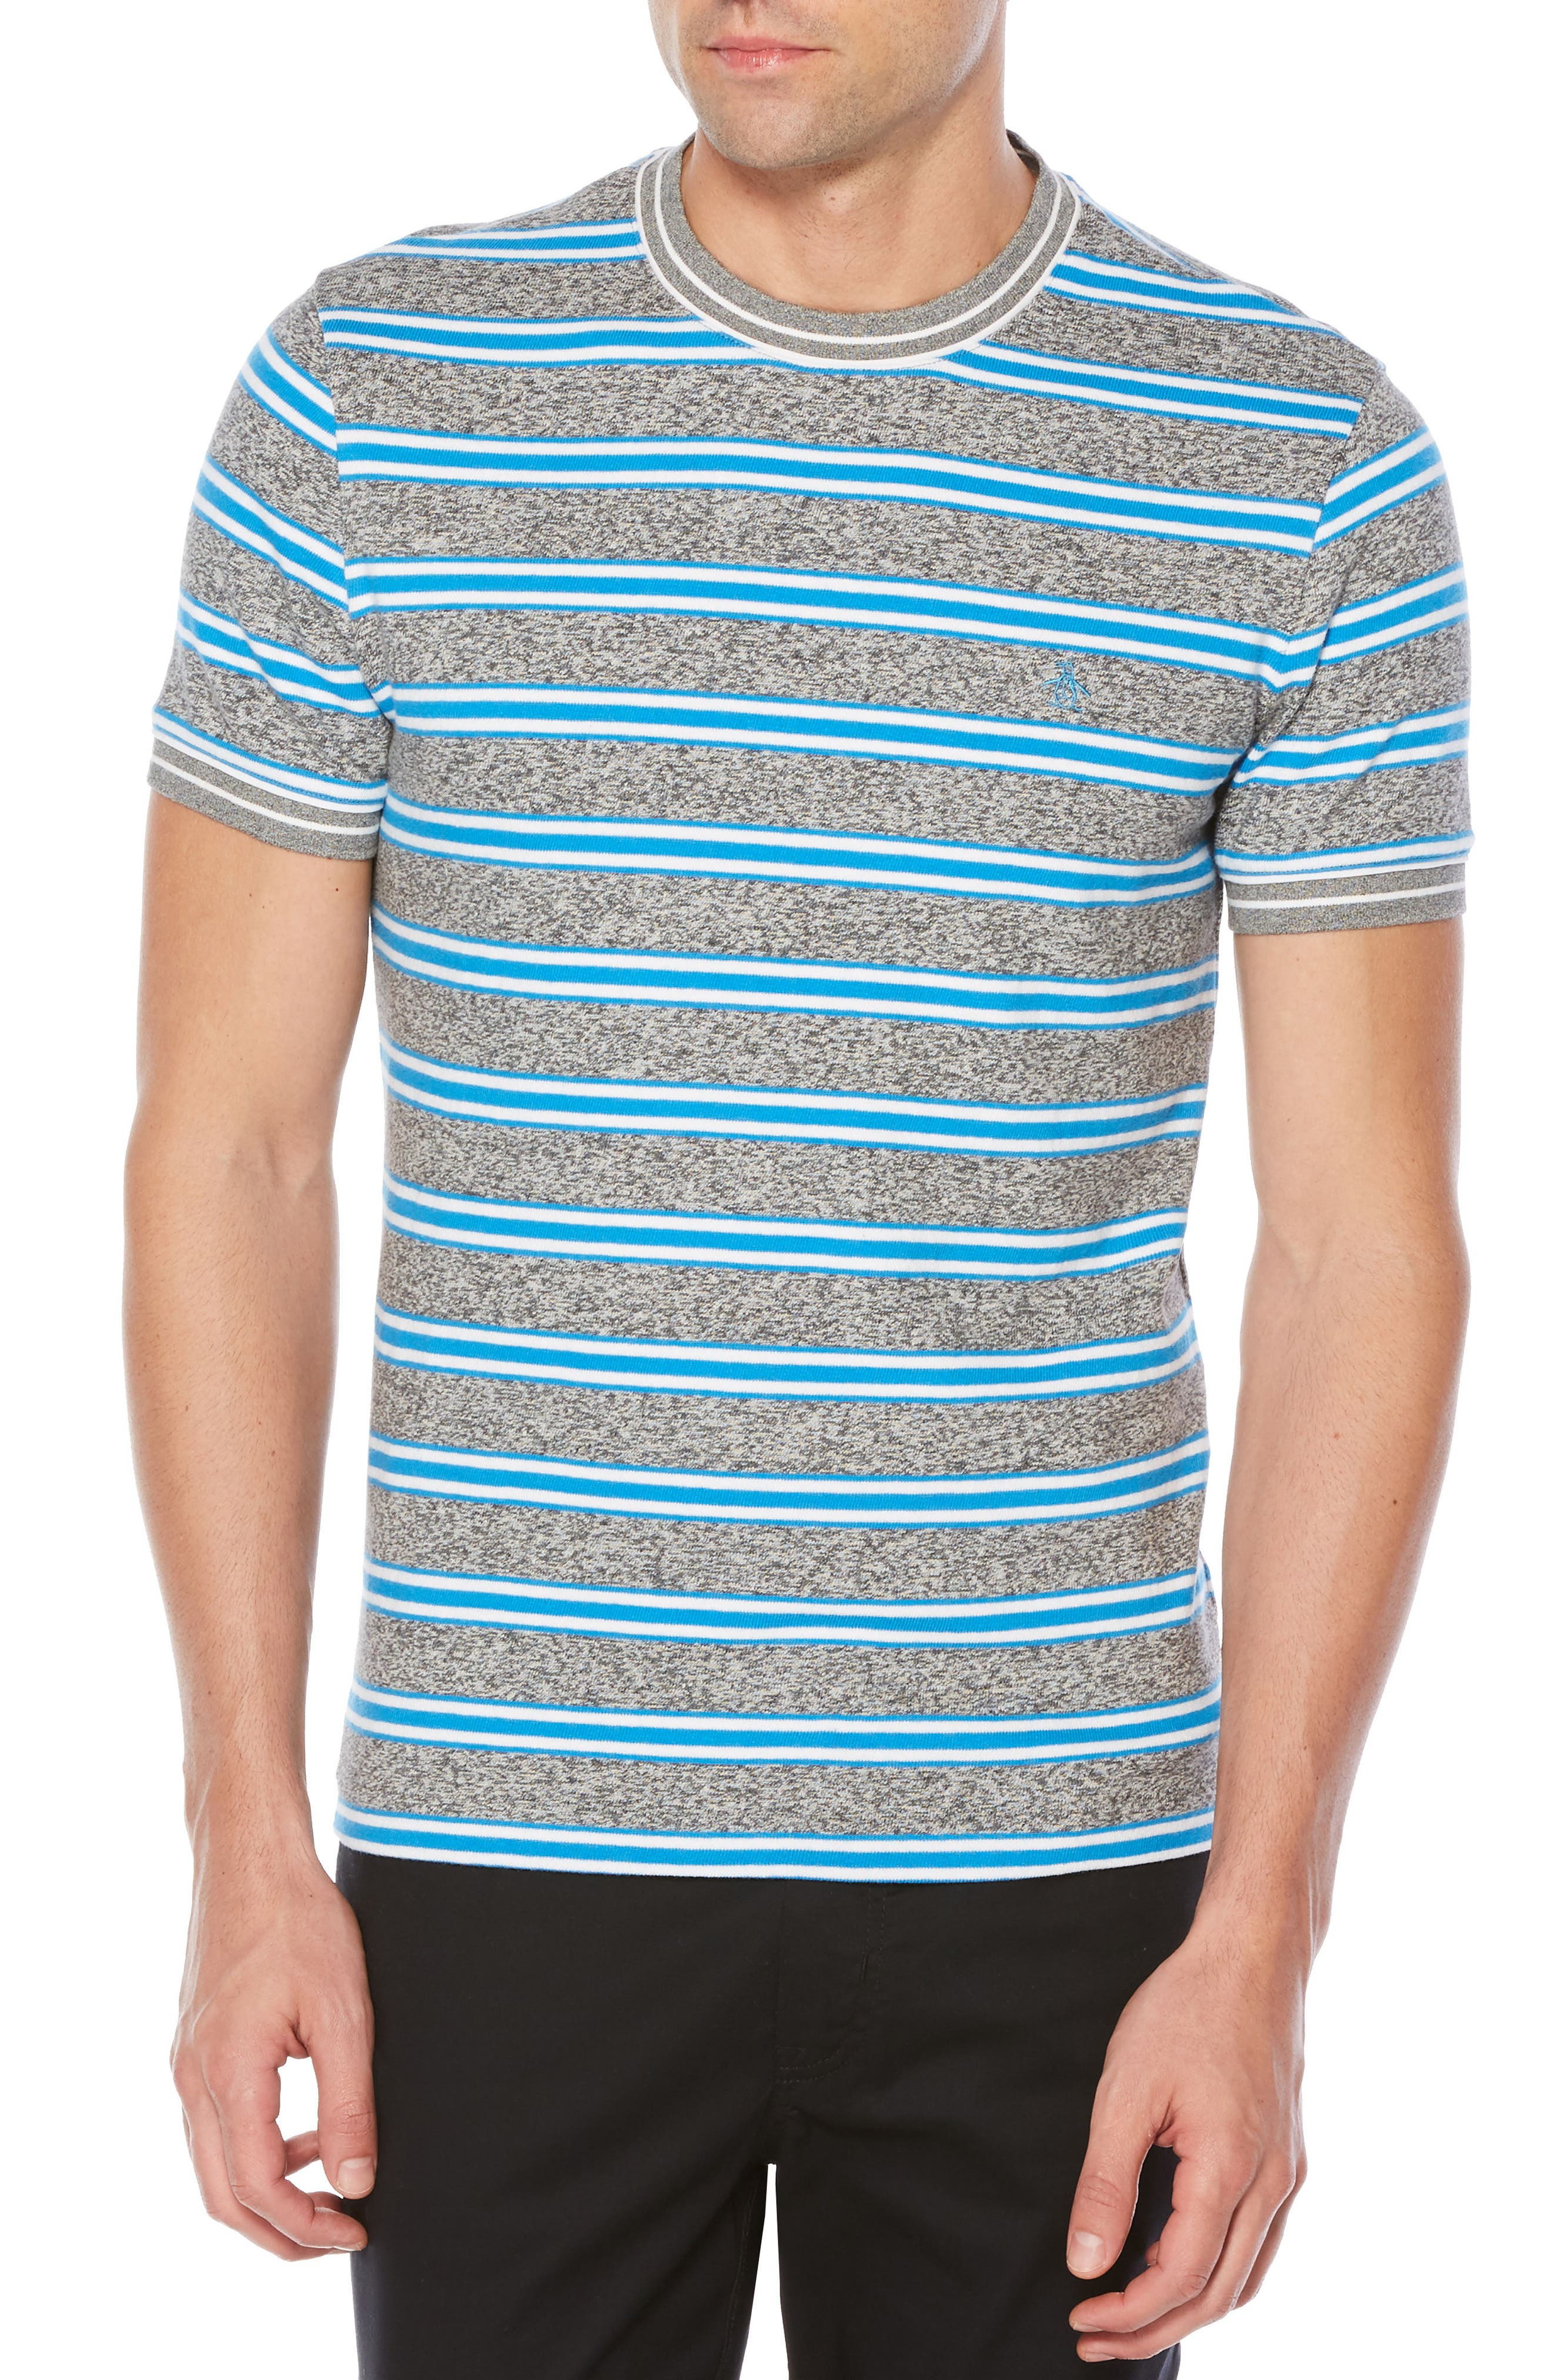 Alternate Image 1 Selected - Original Penguin Jaspé Retro Stripe T-Shirt